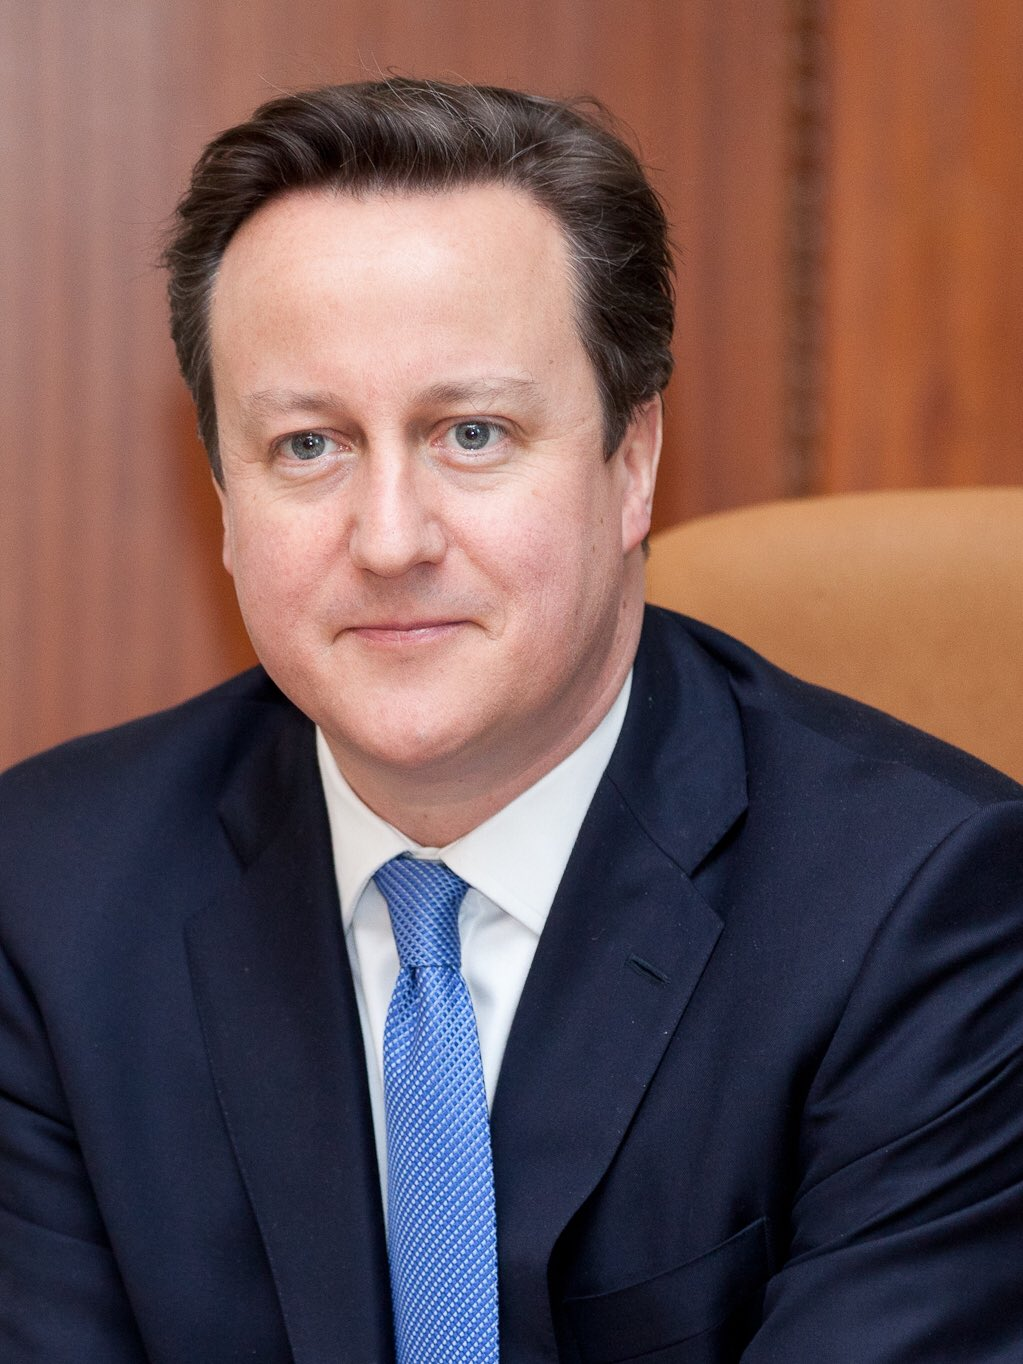 Happy birthday Prime Minister David Cameron!